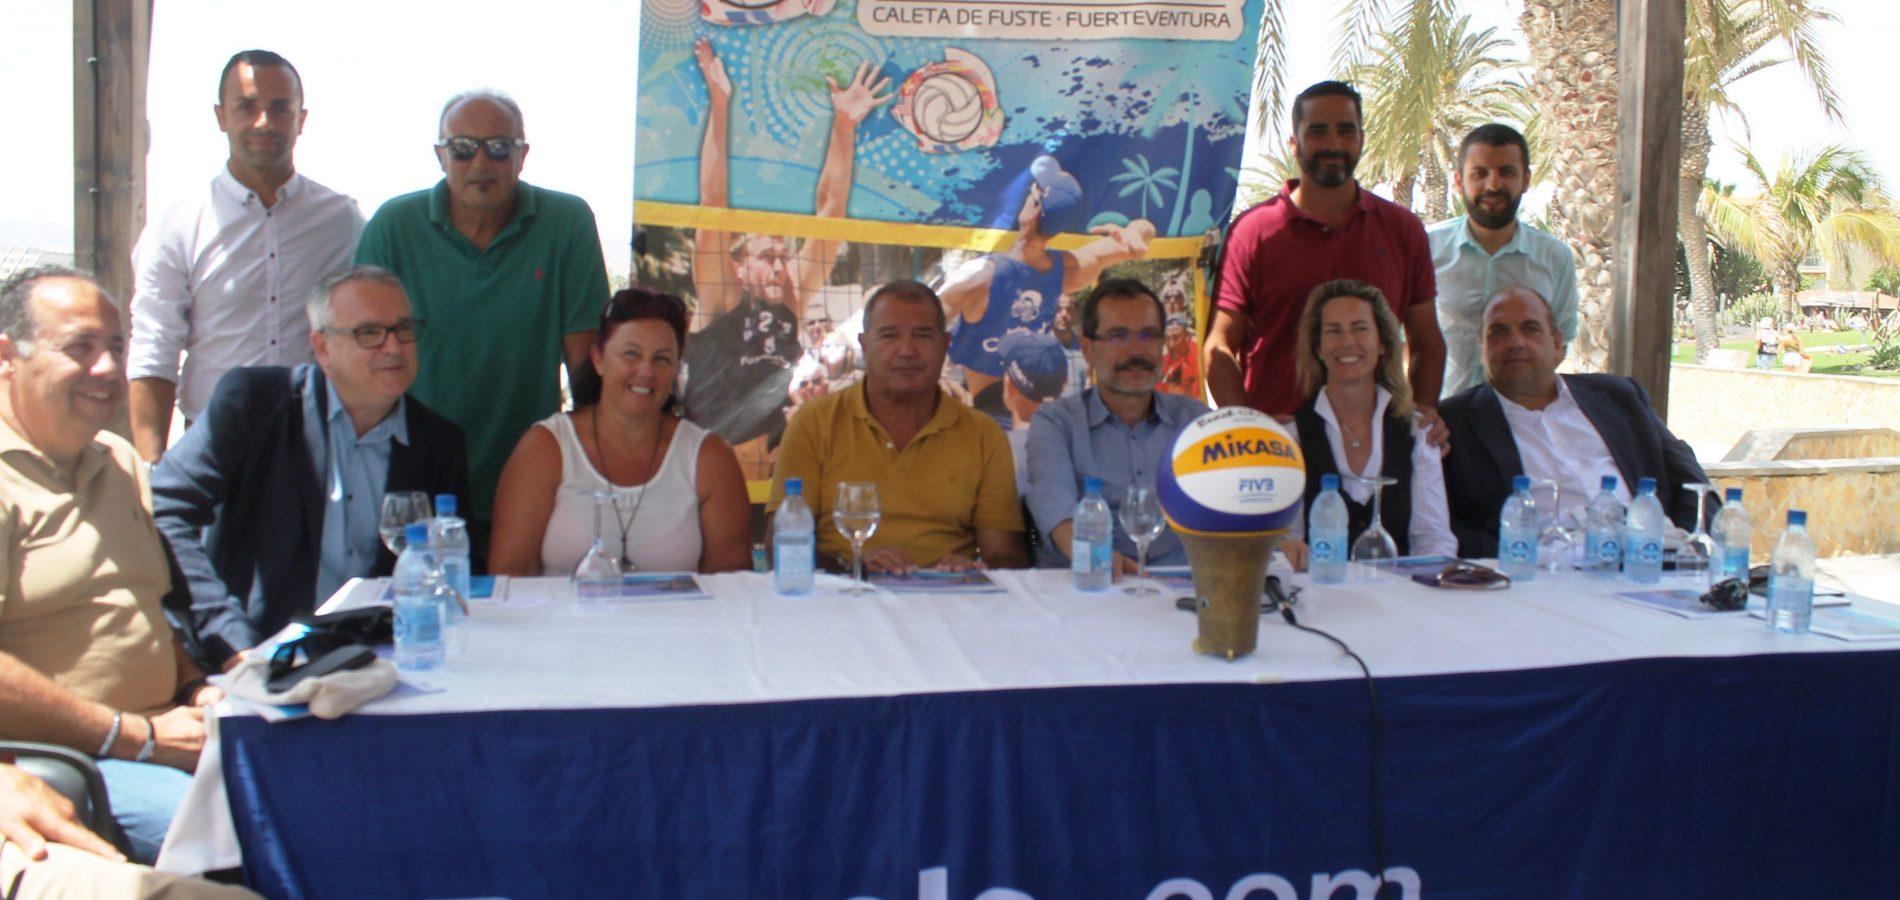 AECA will sponsor Caleta de Fuste International Beach Volley Tournament.